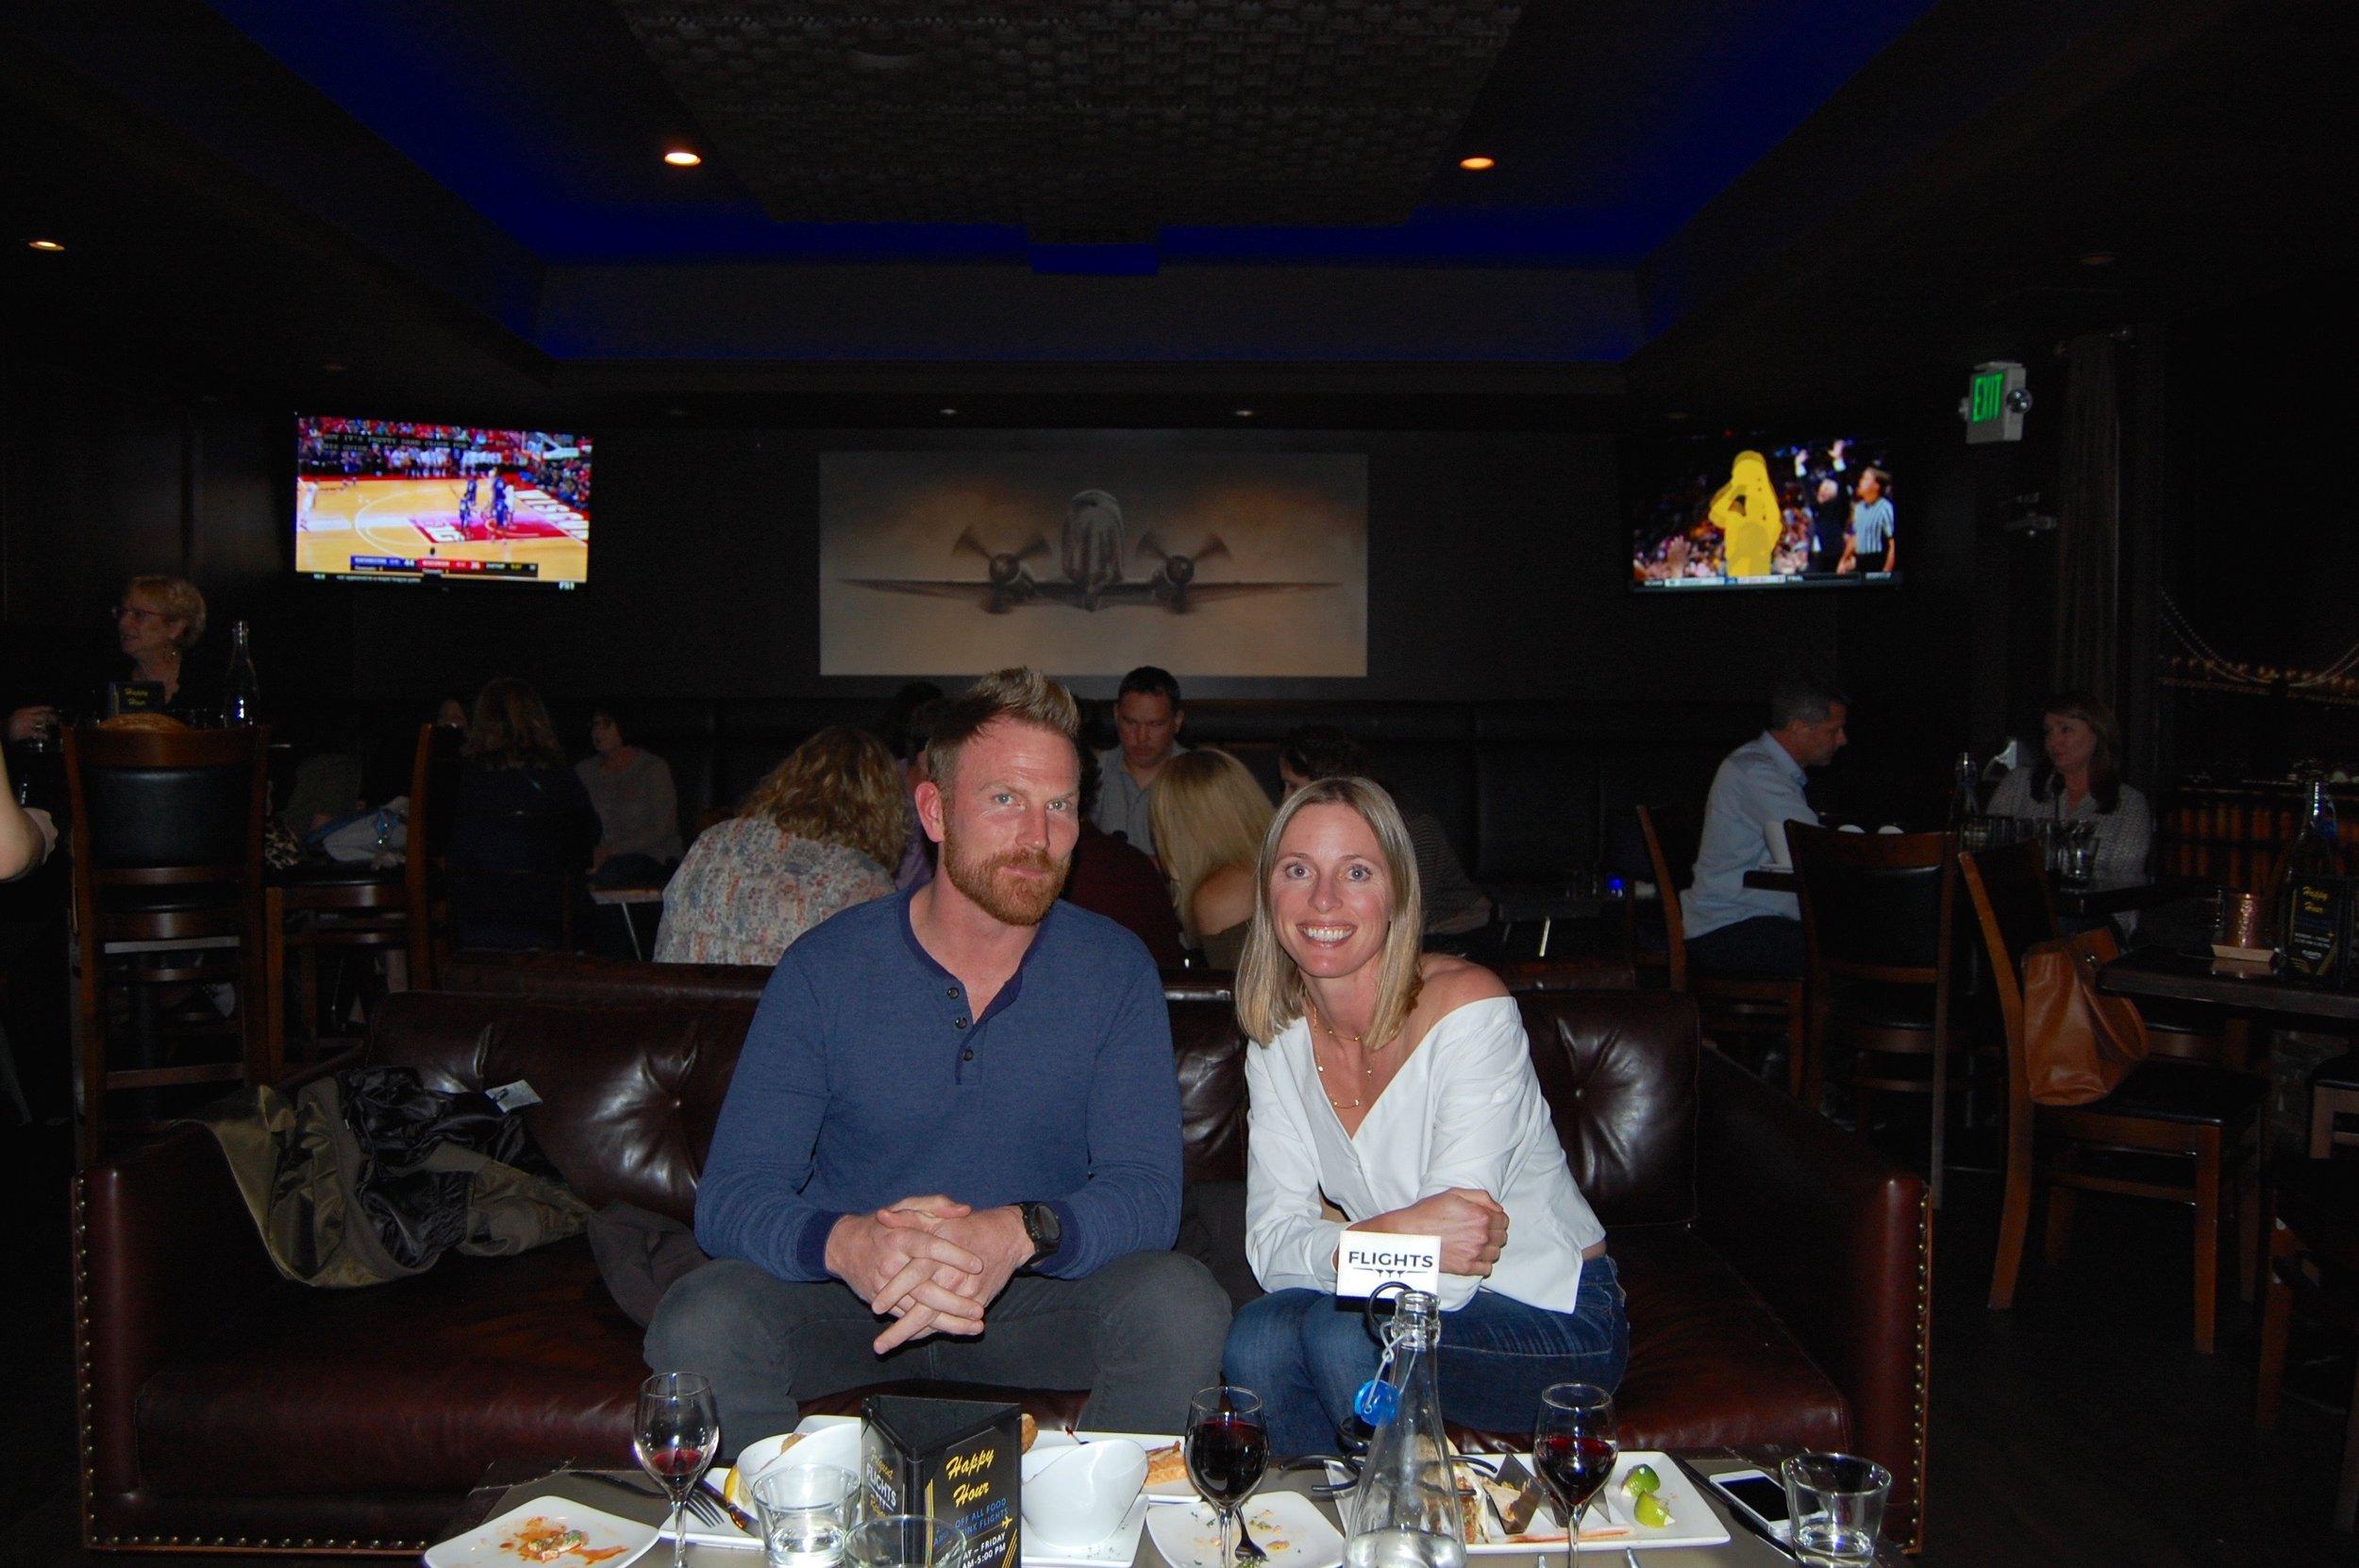 Date Night at Flights Los Gatos